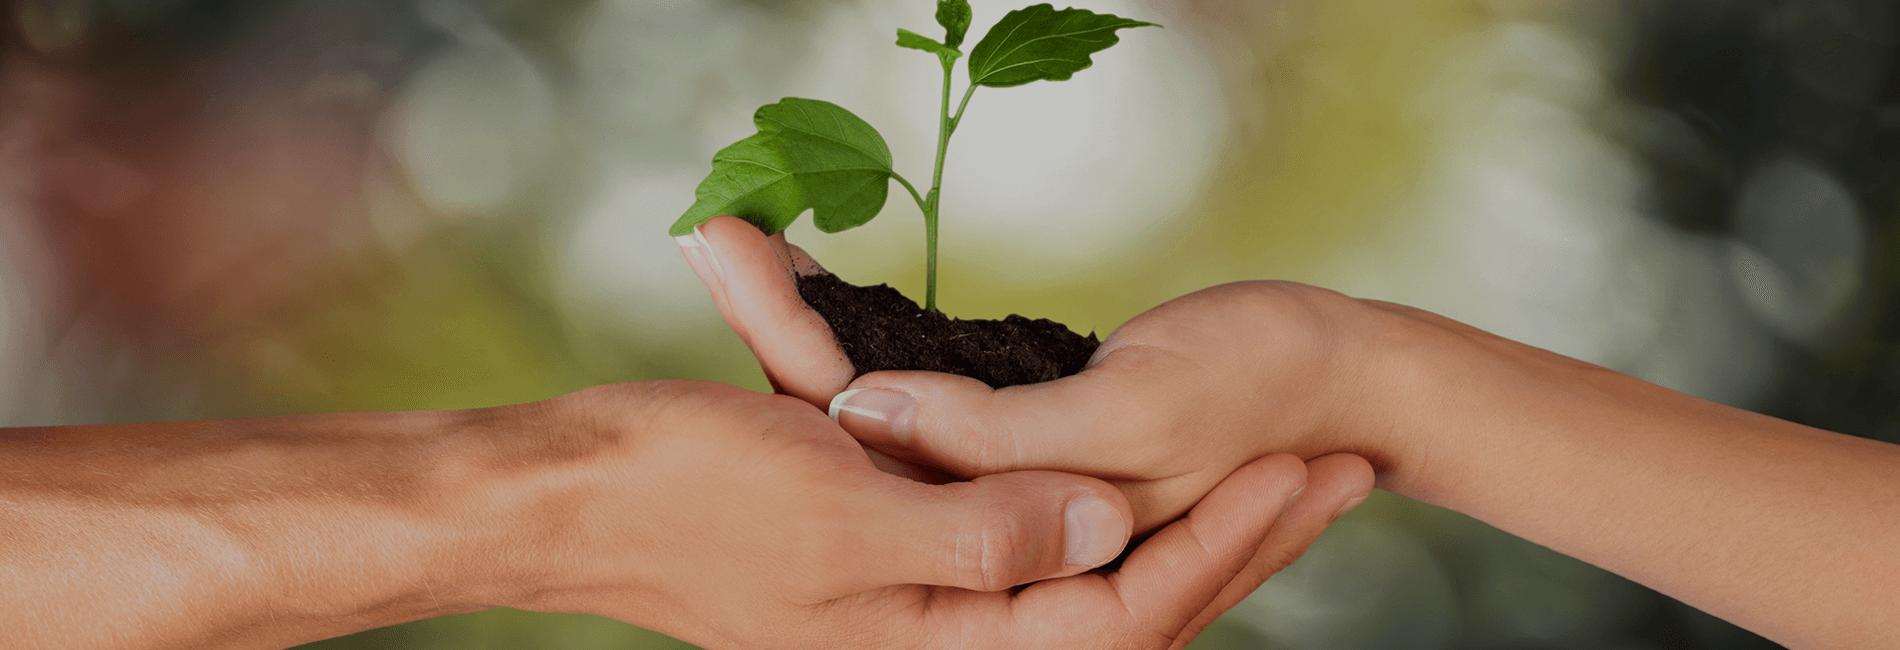 era-environmental-environmental-resources.png